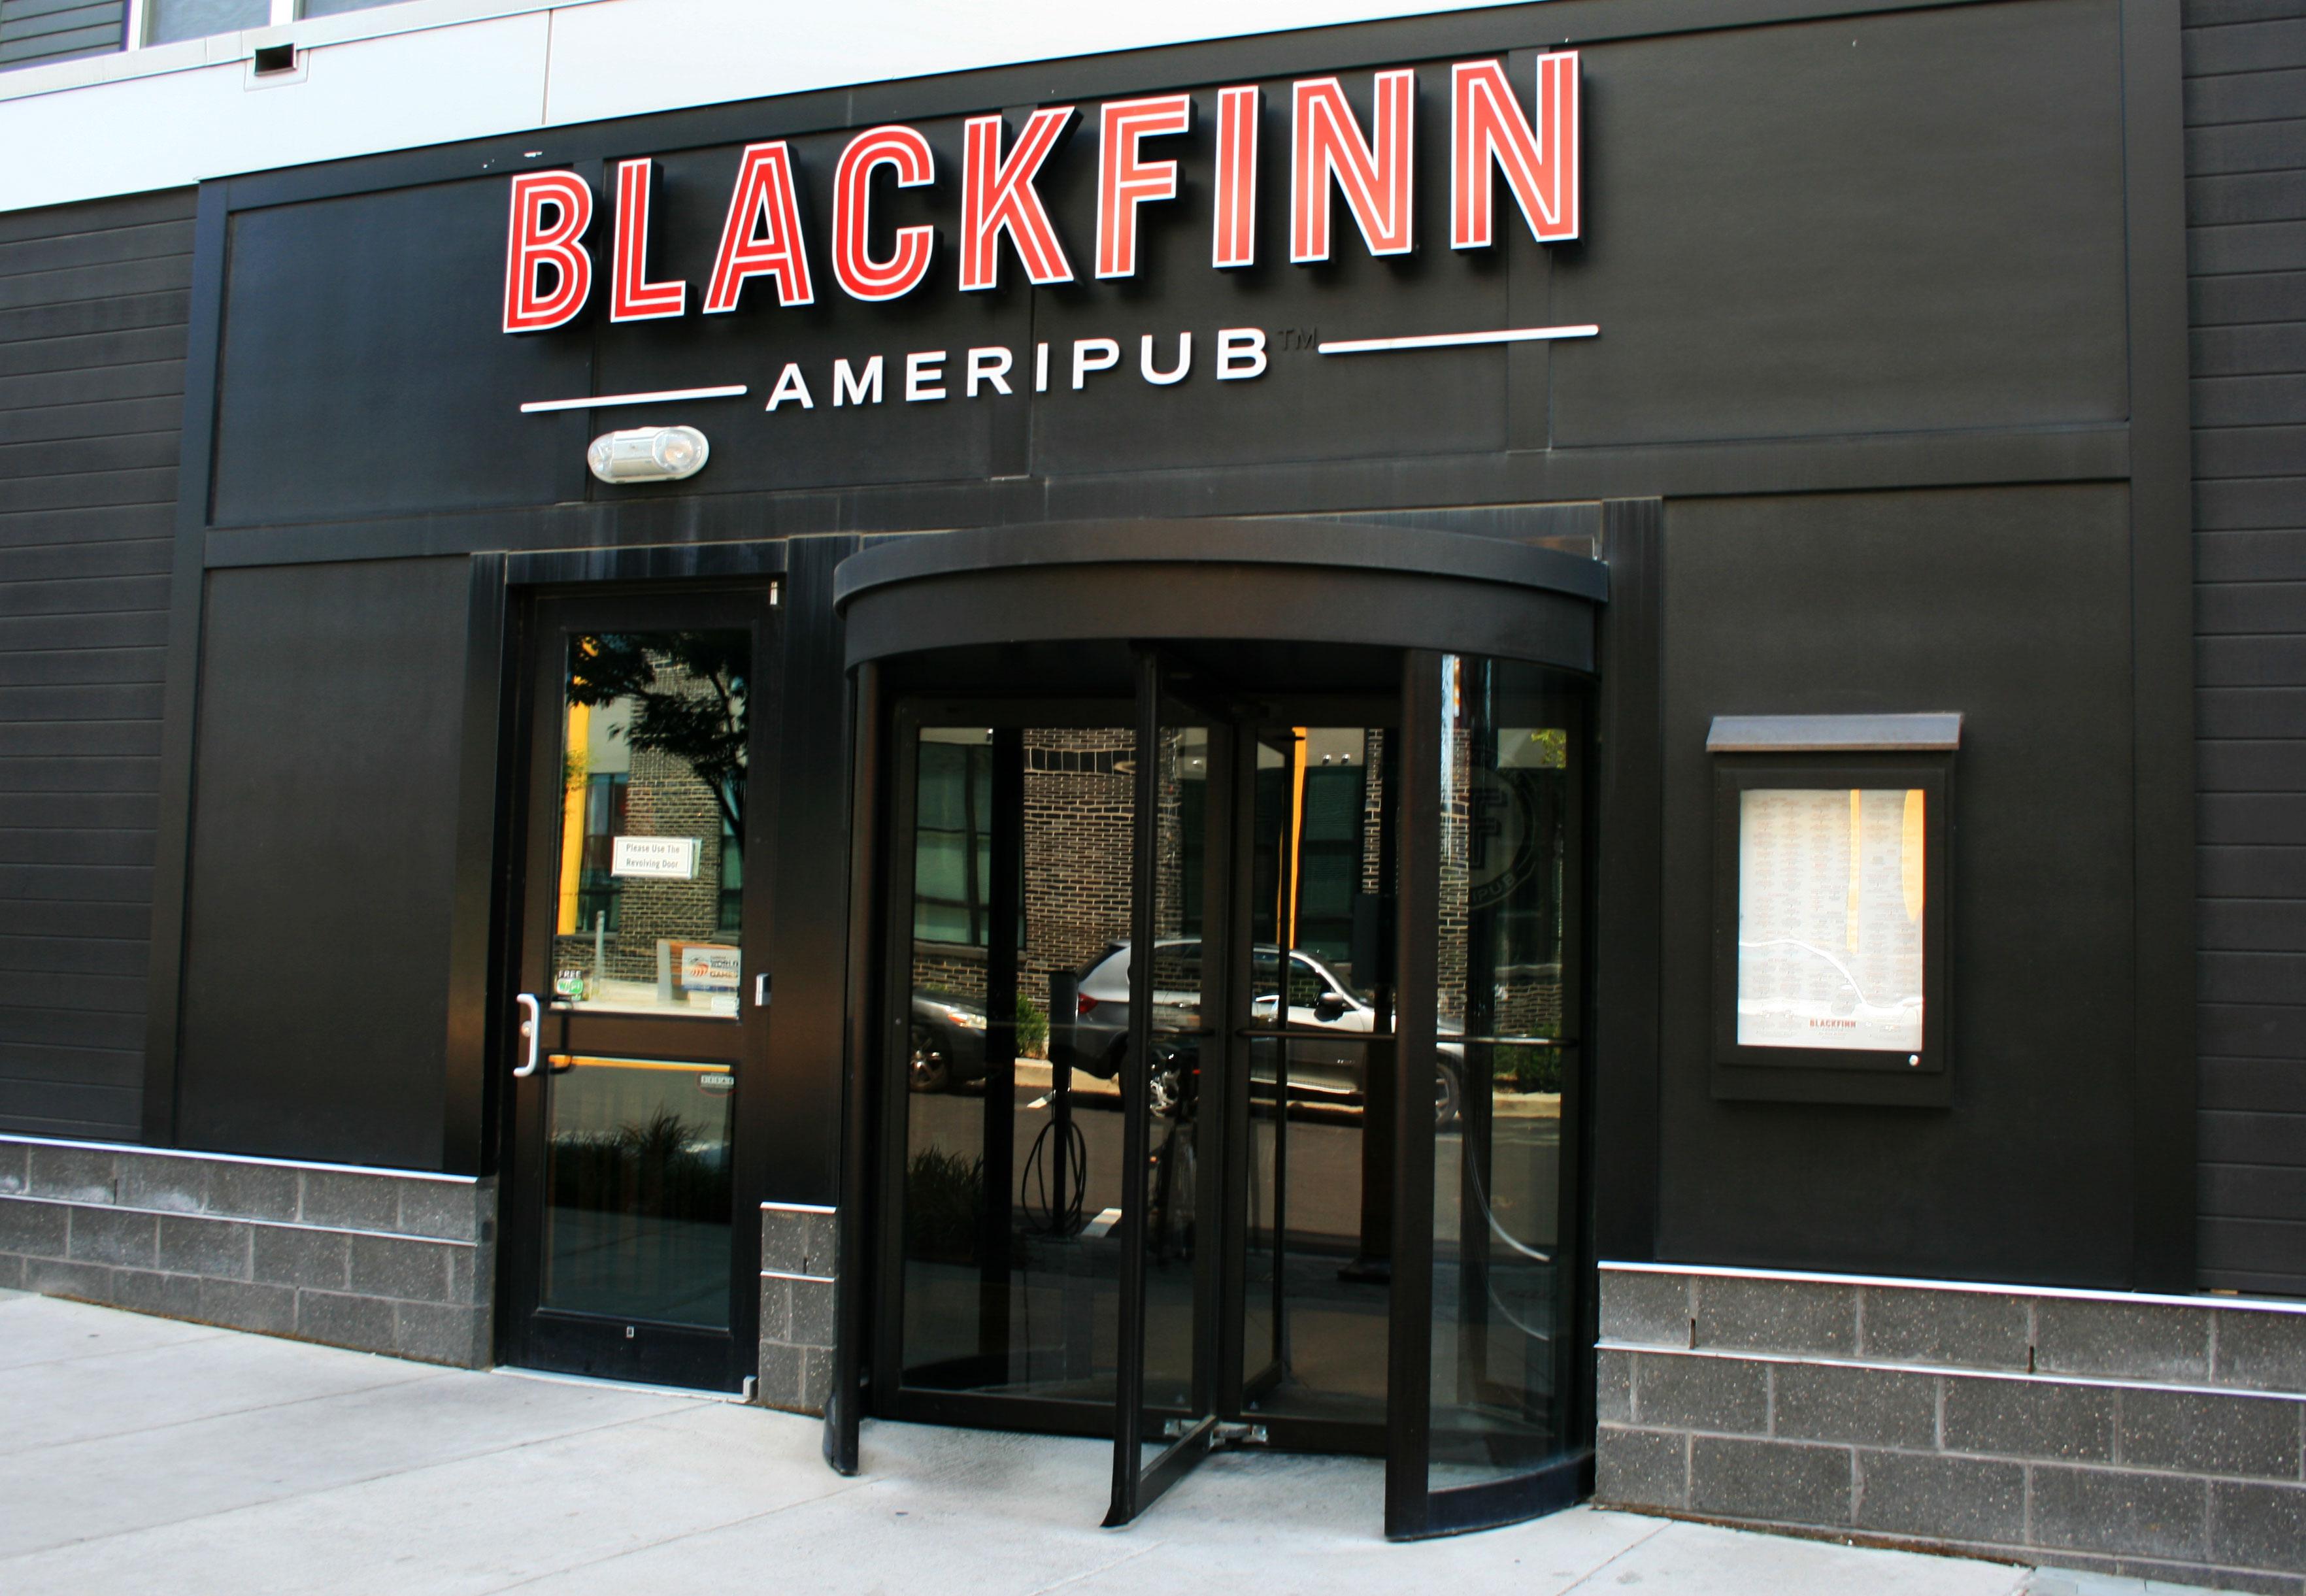 Blackfinn Ameripub-Merrifield